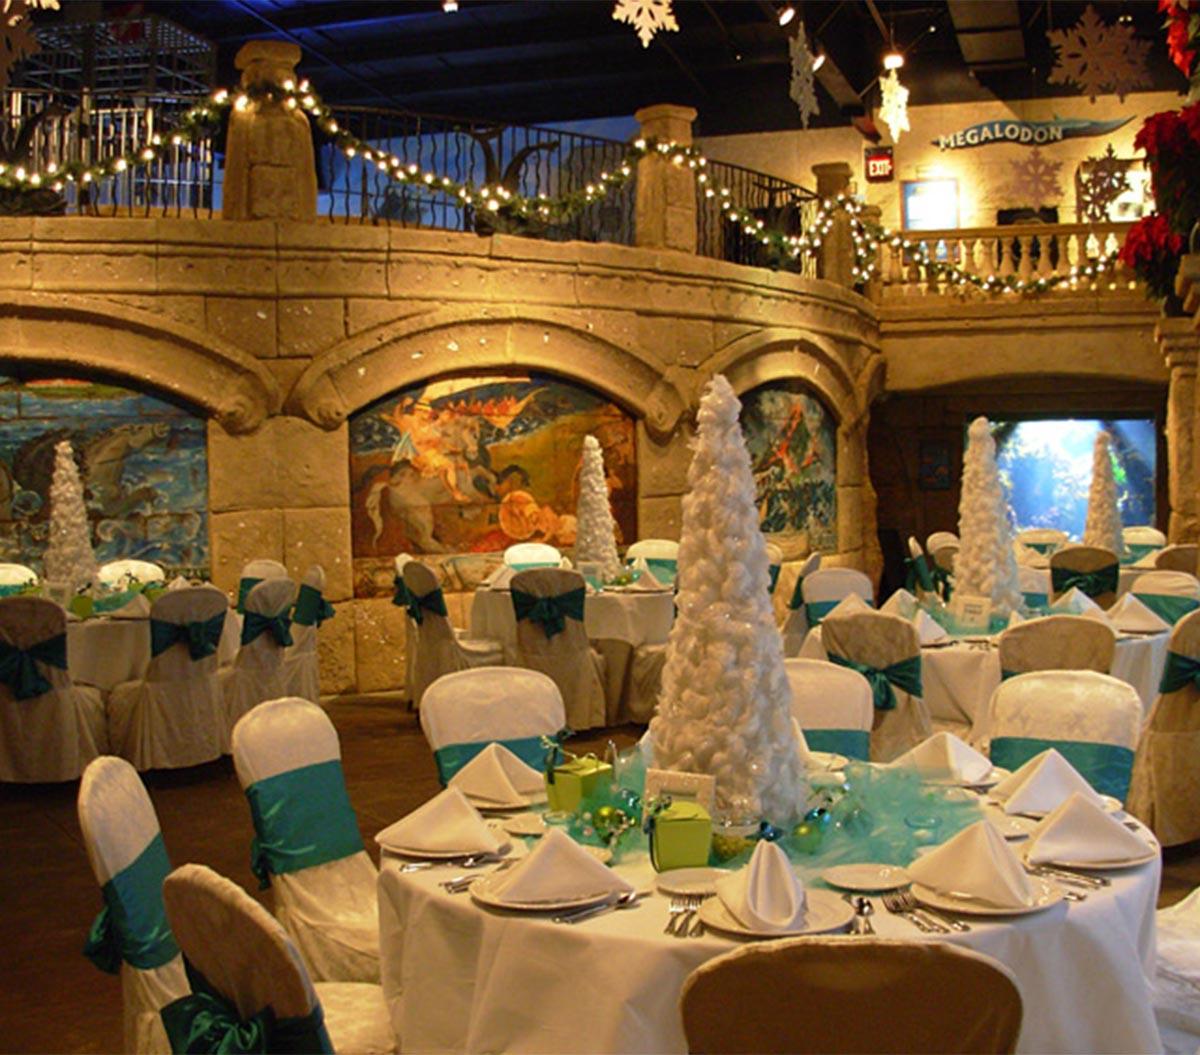 Proms & Senior Banquets